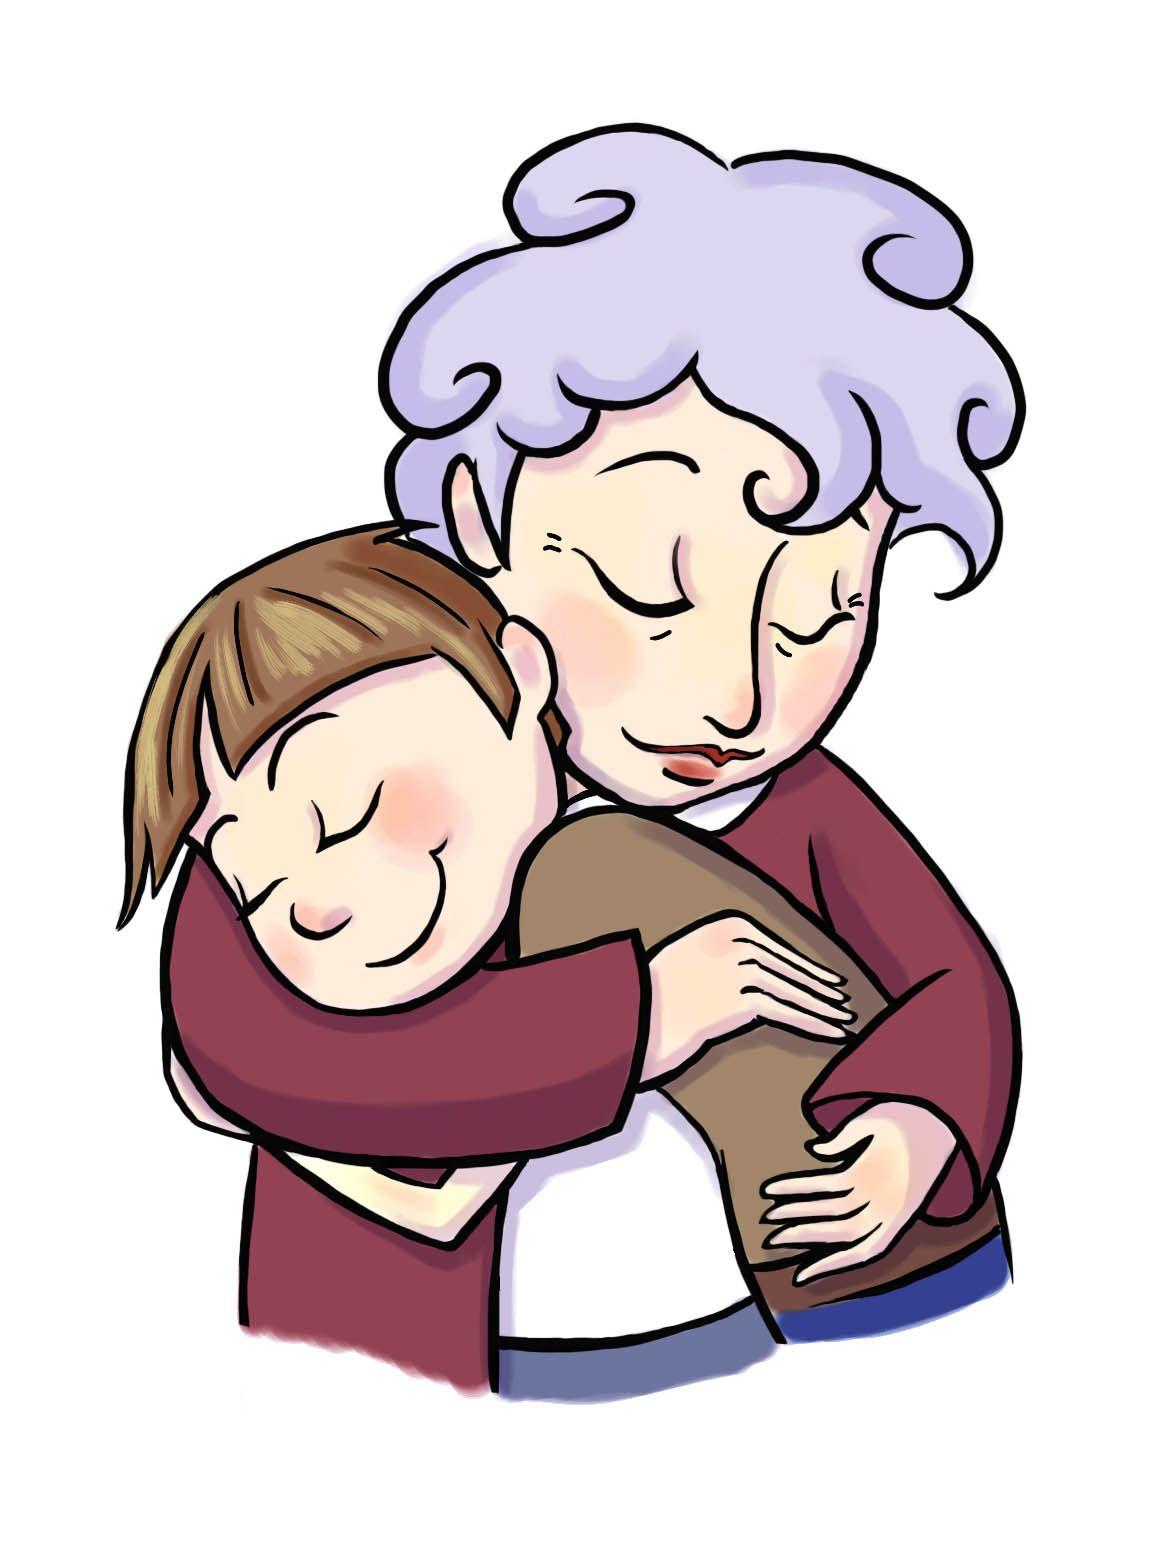 Grandma hugging grandchildren clipart black and white clip art black and white download Cartoon Grandma And Granddaughter Clipart - Clipart Kid | Creatives ... clip art black and white download